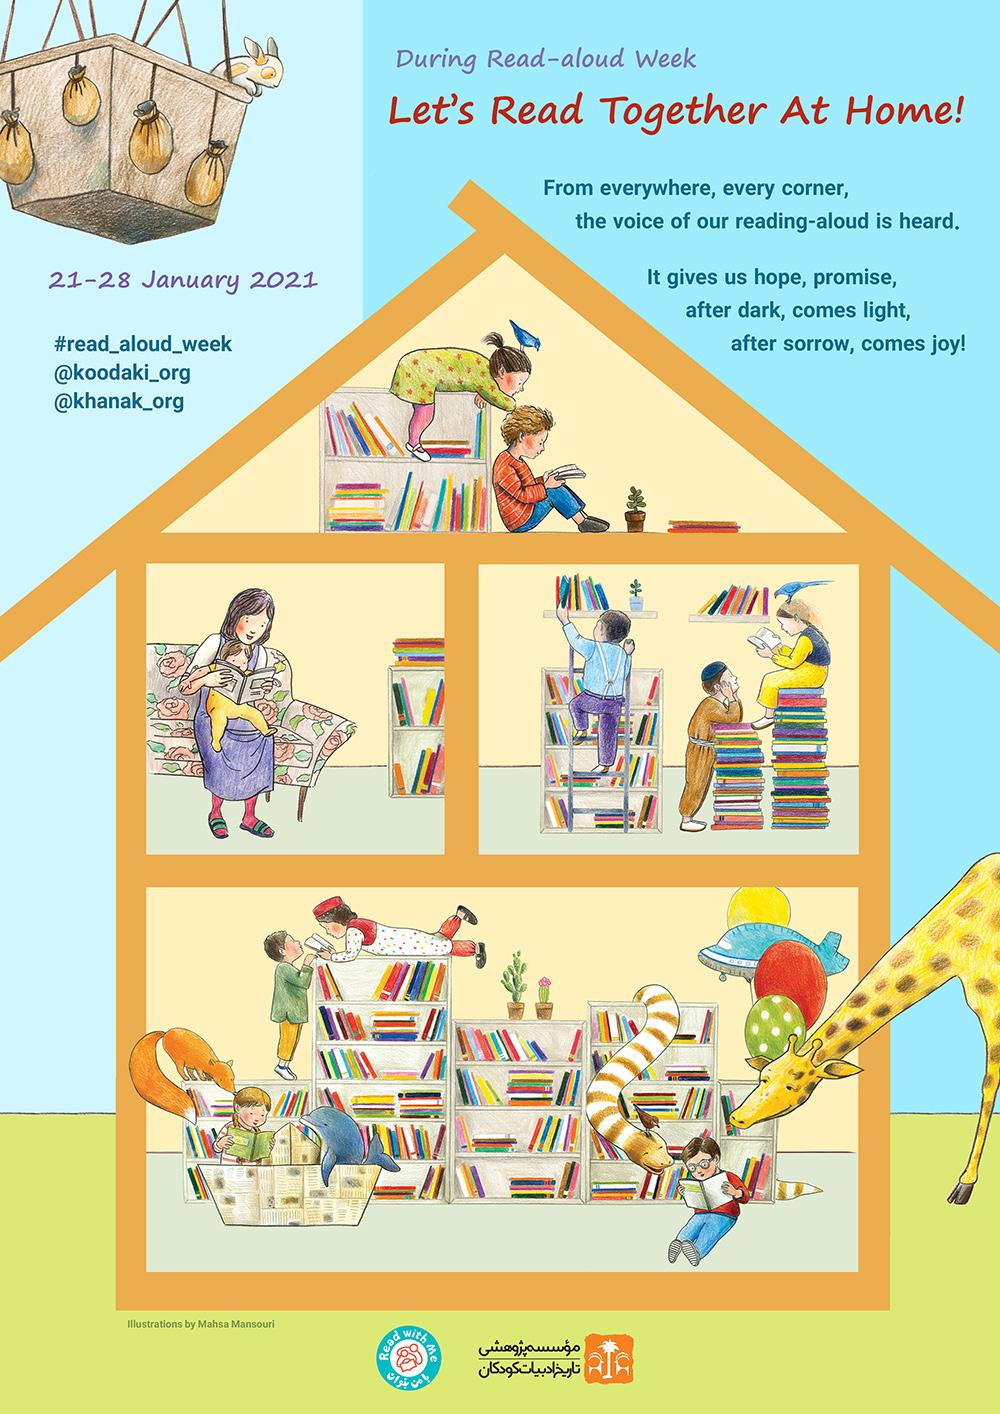 Read-aloud Week-21-28 January 2021-poster